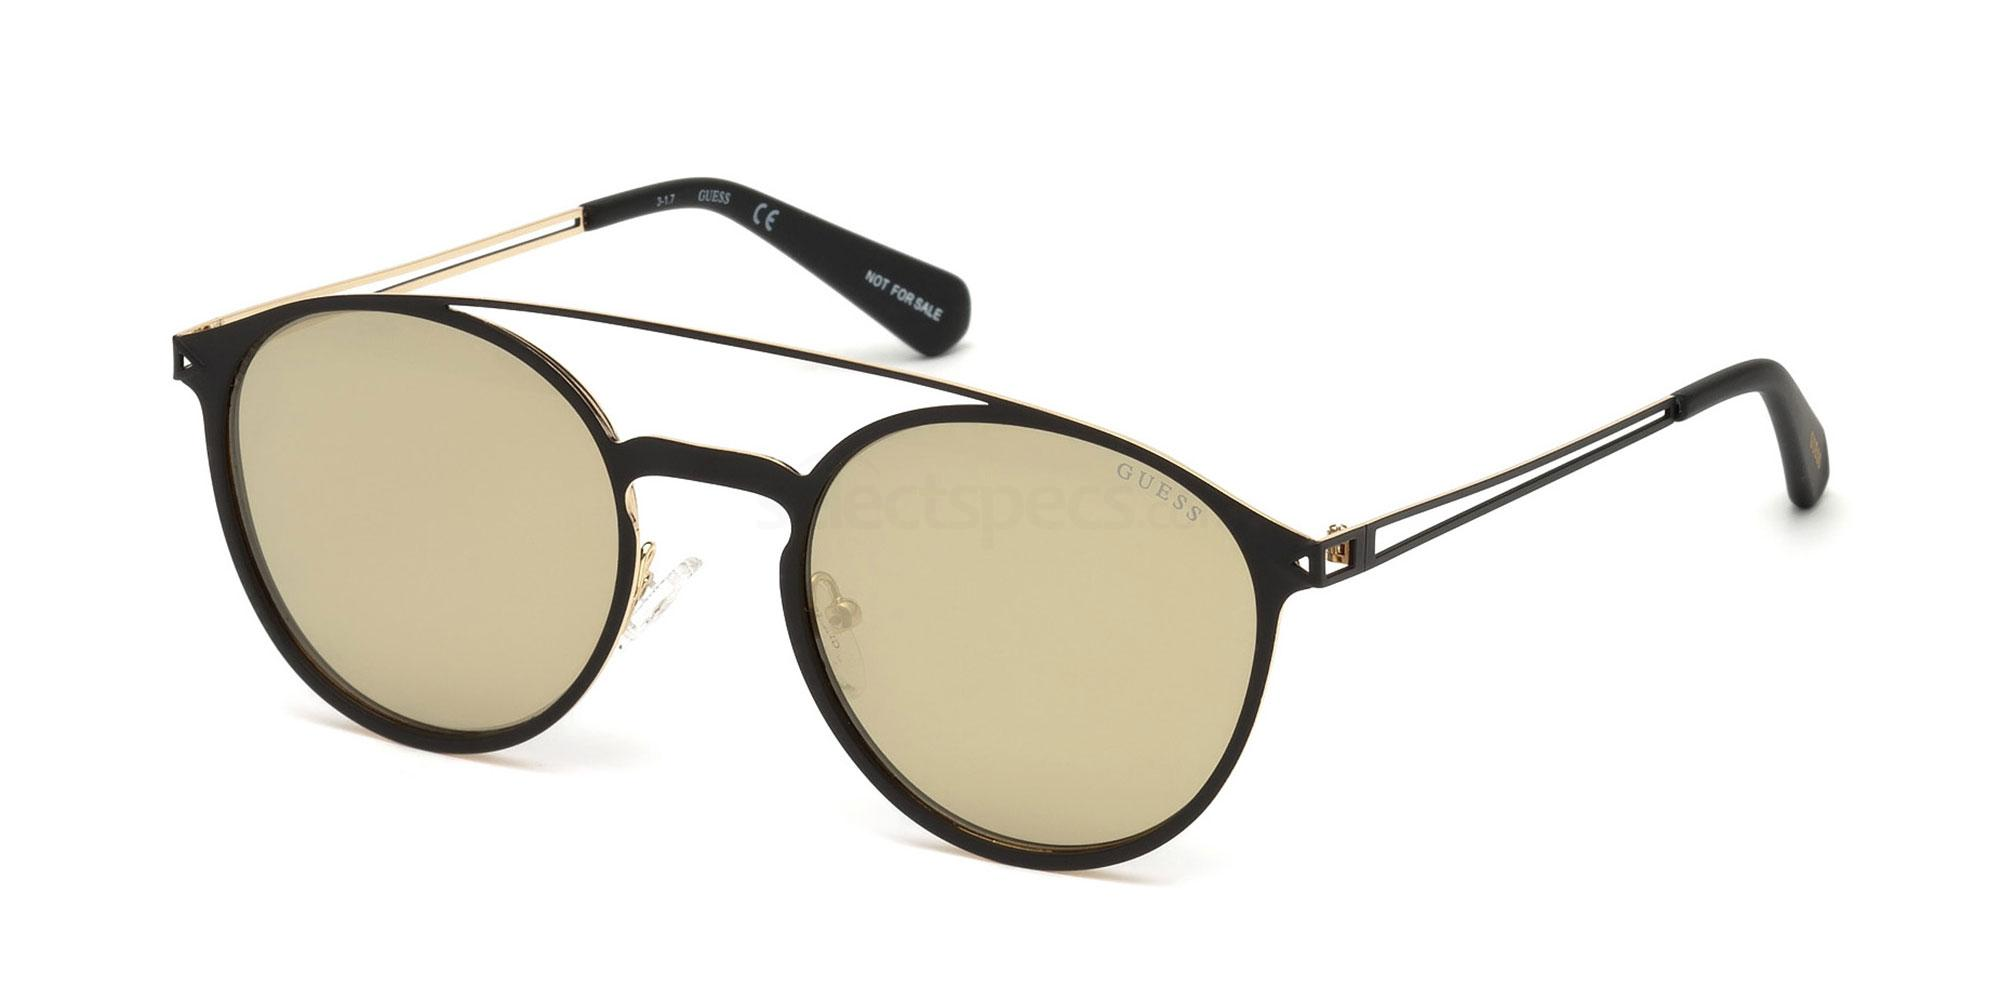 02G GU6921 Sunglasses, Guess